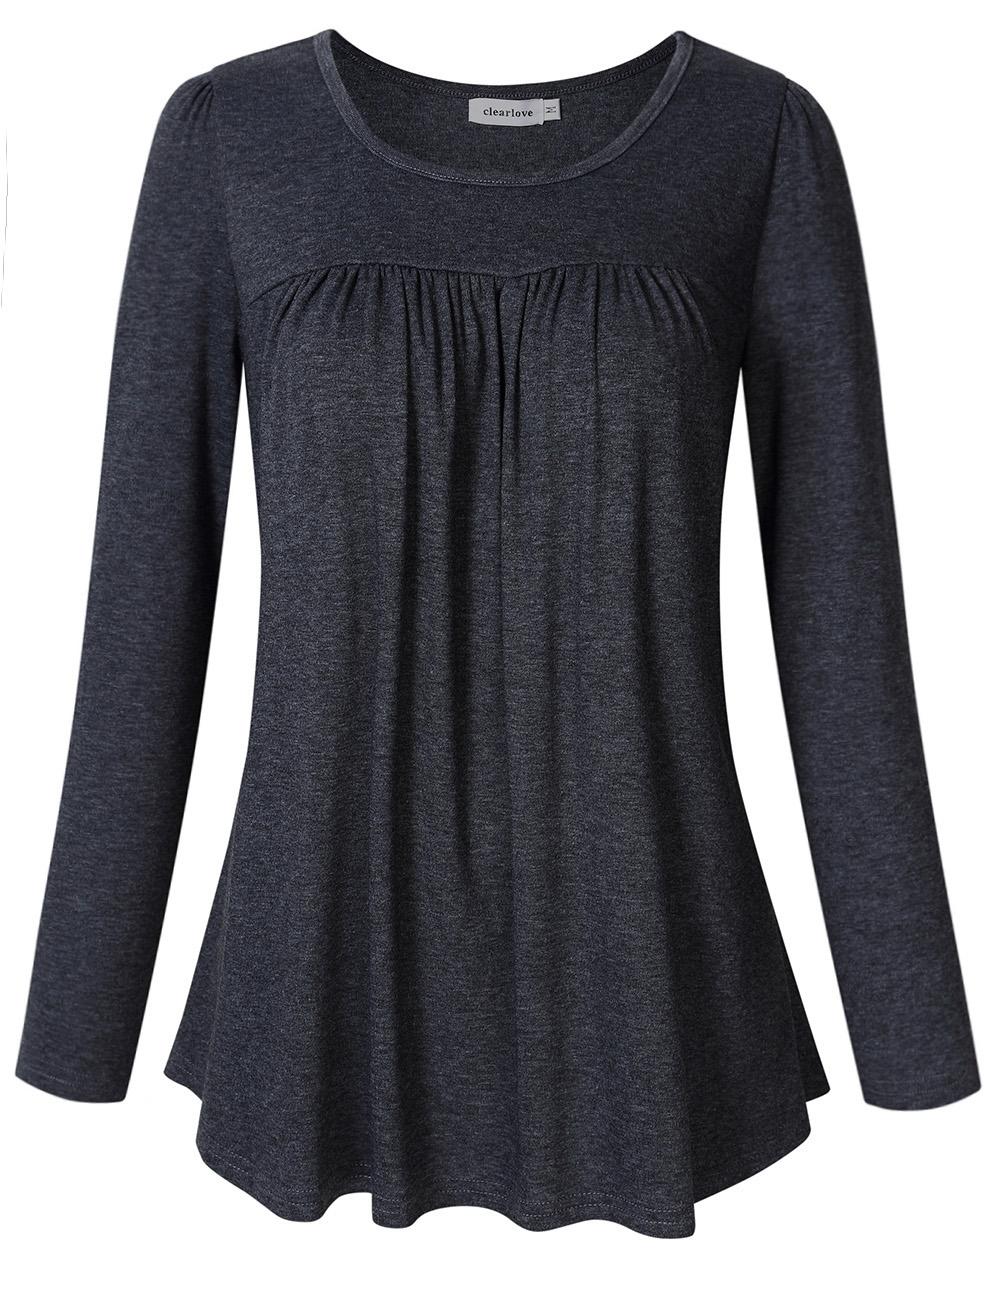 Clearlove Women Scoop Neck Pleated Top Blouse Long Sleeve Tunic Shirt Dark grey_2XL